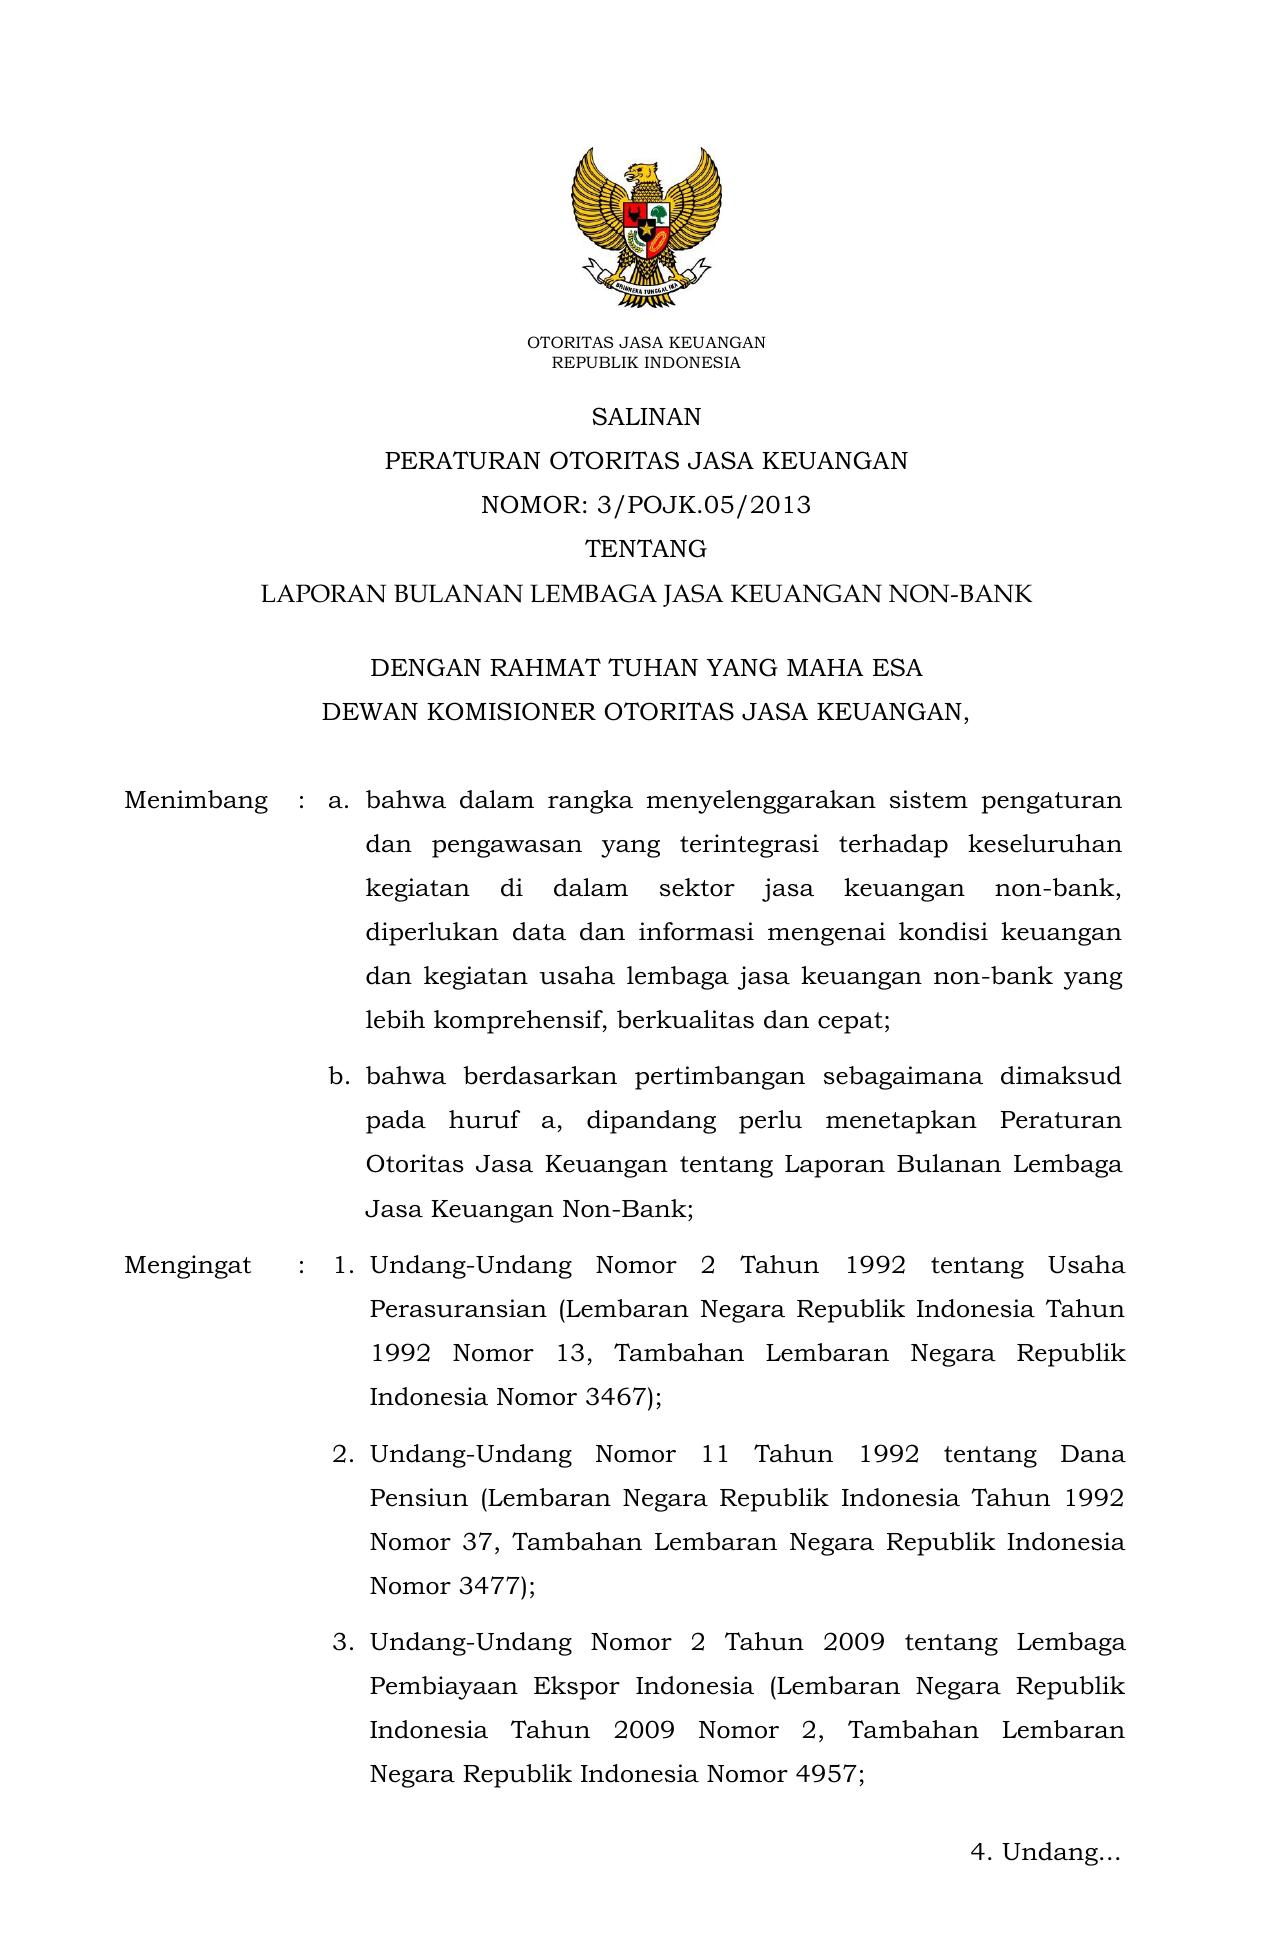 Salinan Peraturan Otoritas Jasa Keuangan Nomor 3